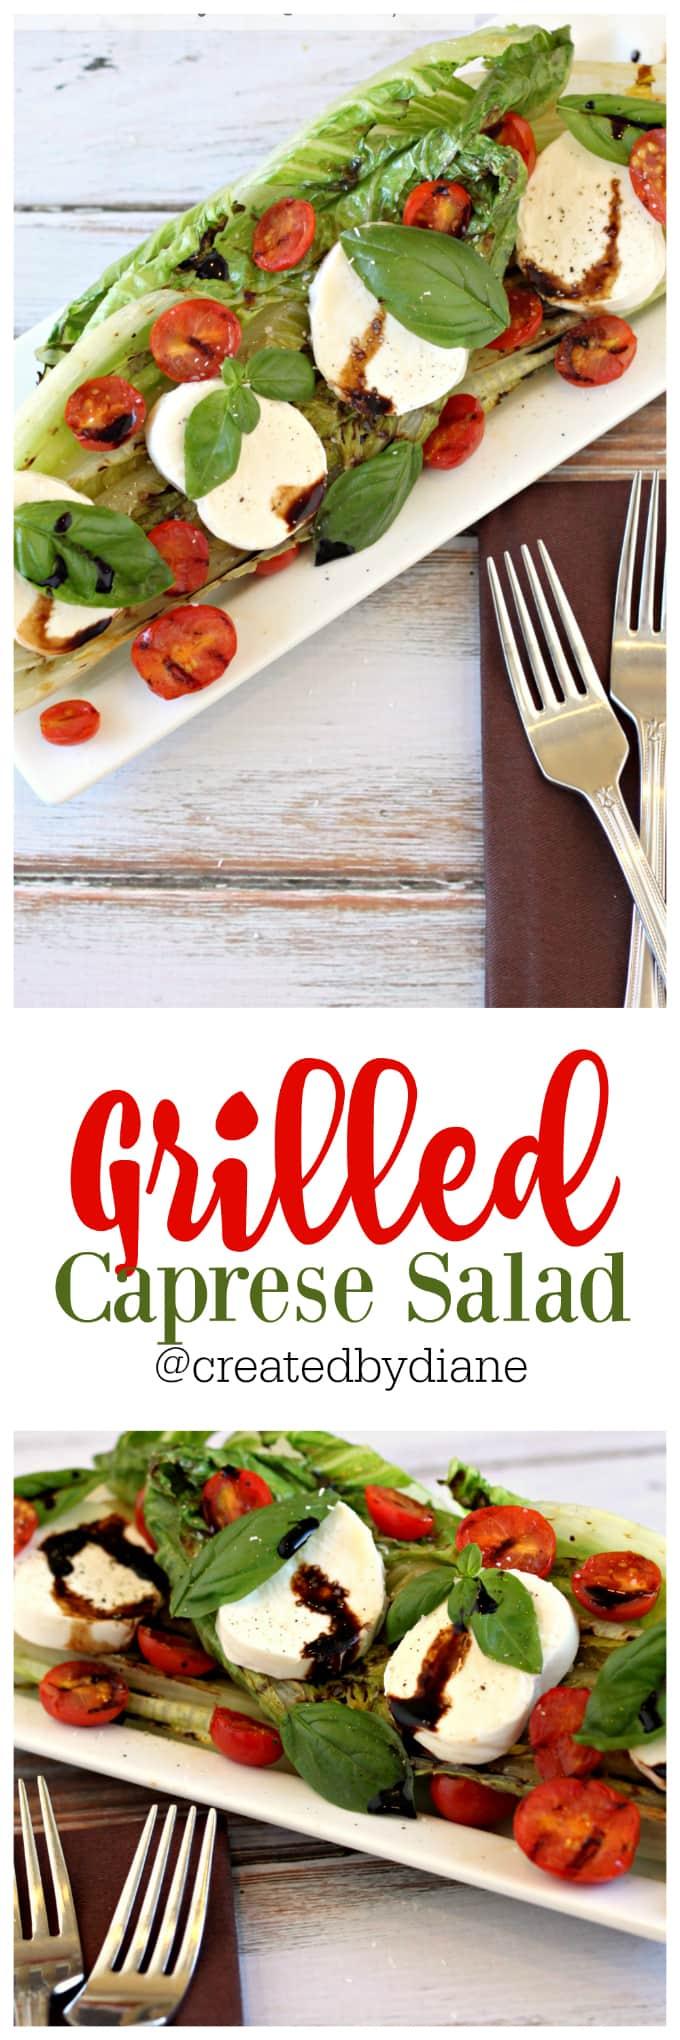 grilled caprese salad @createdbydiane